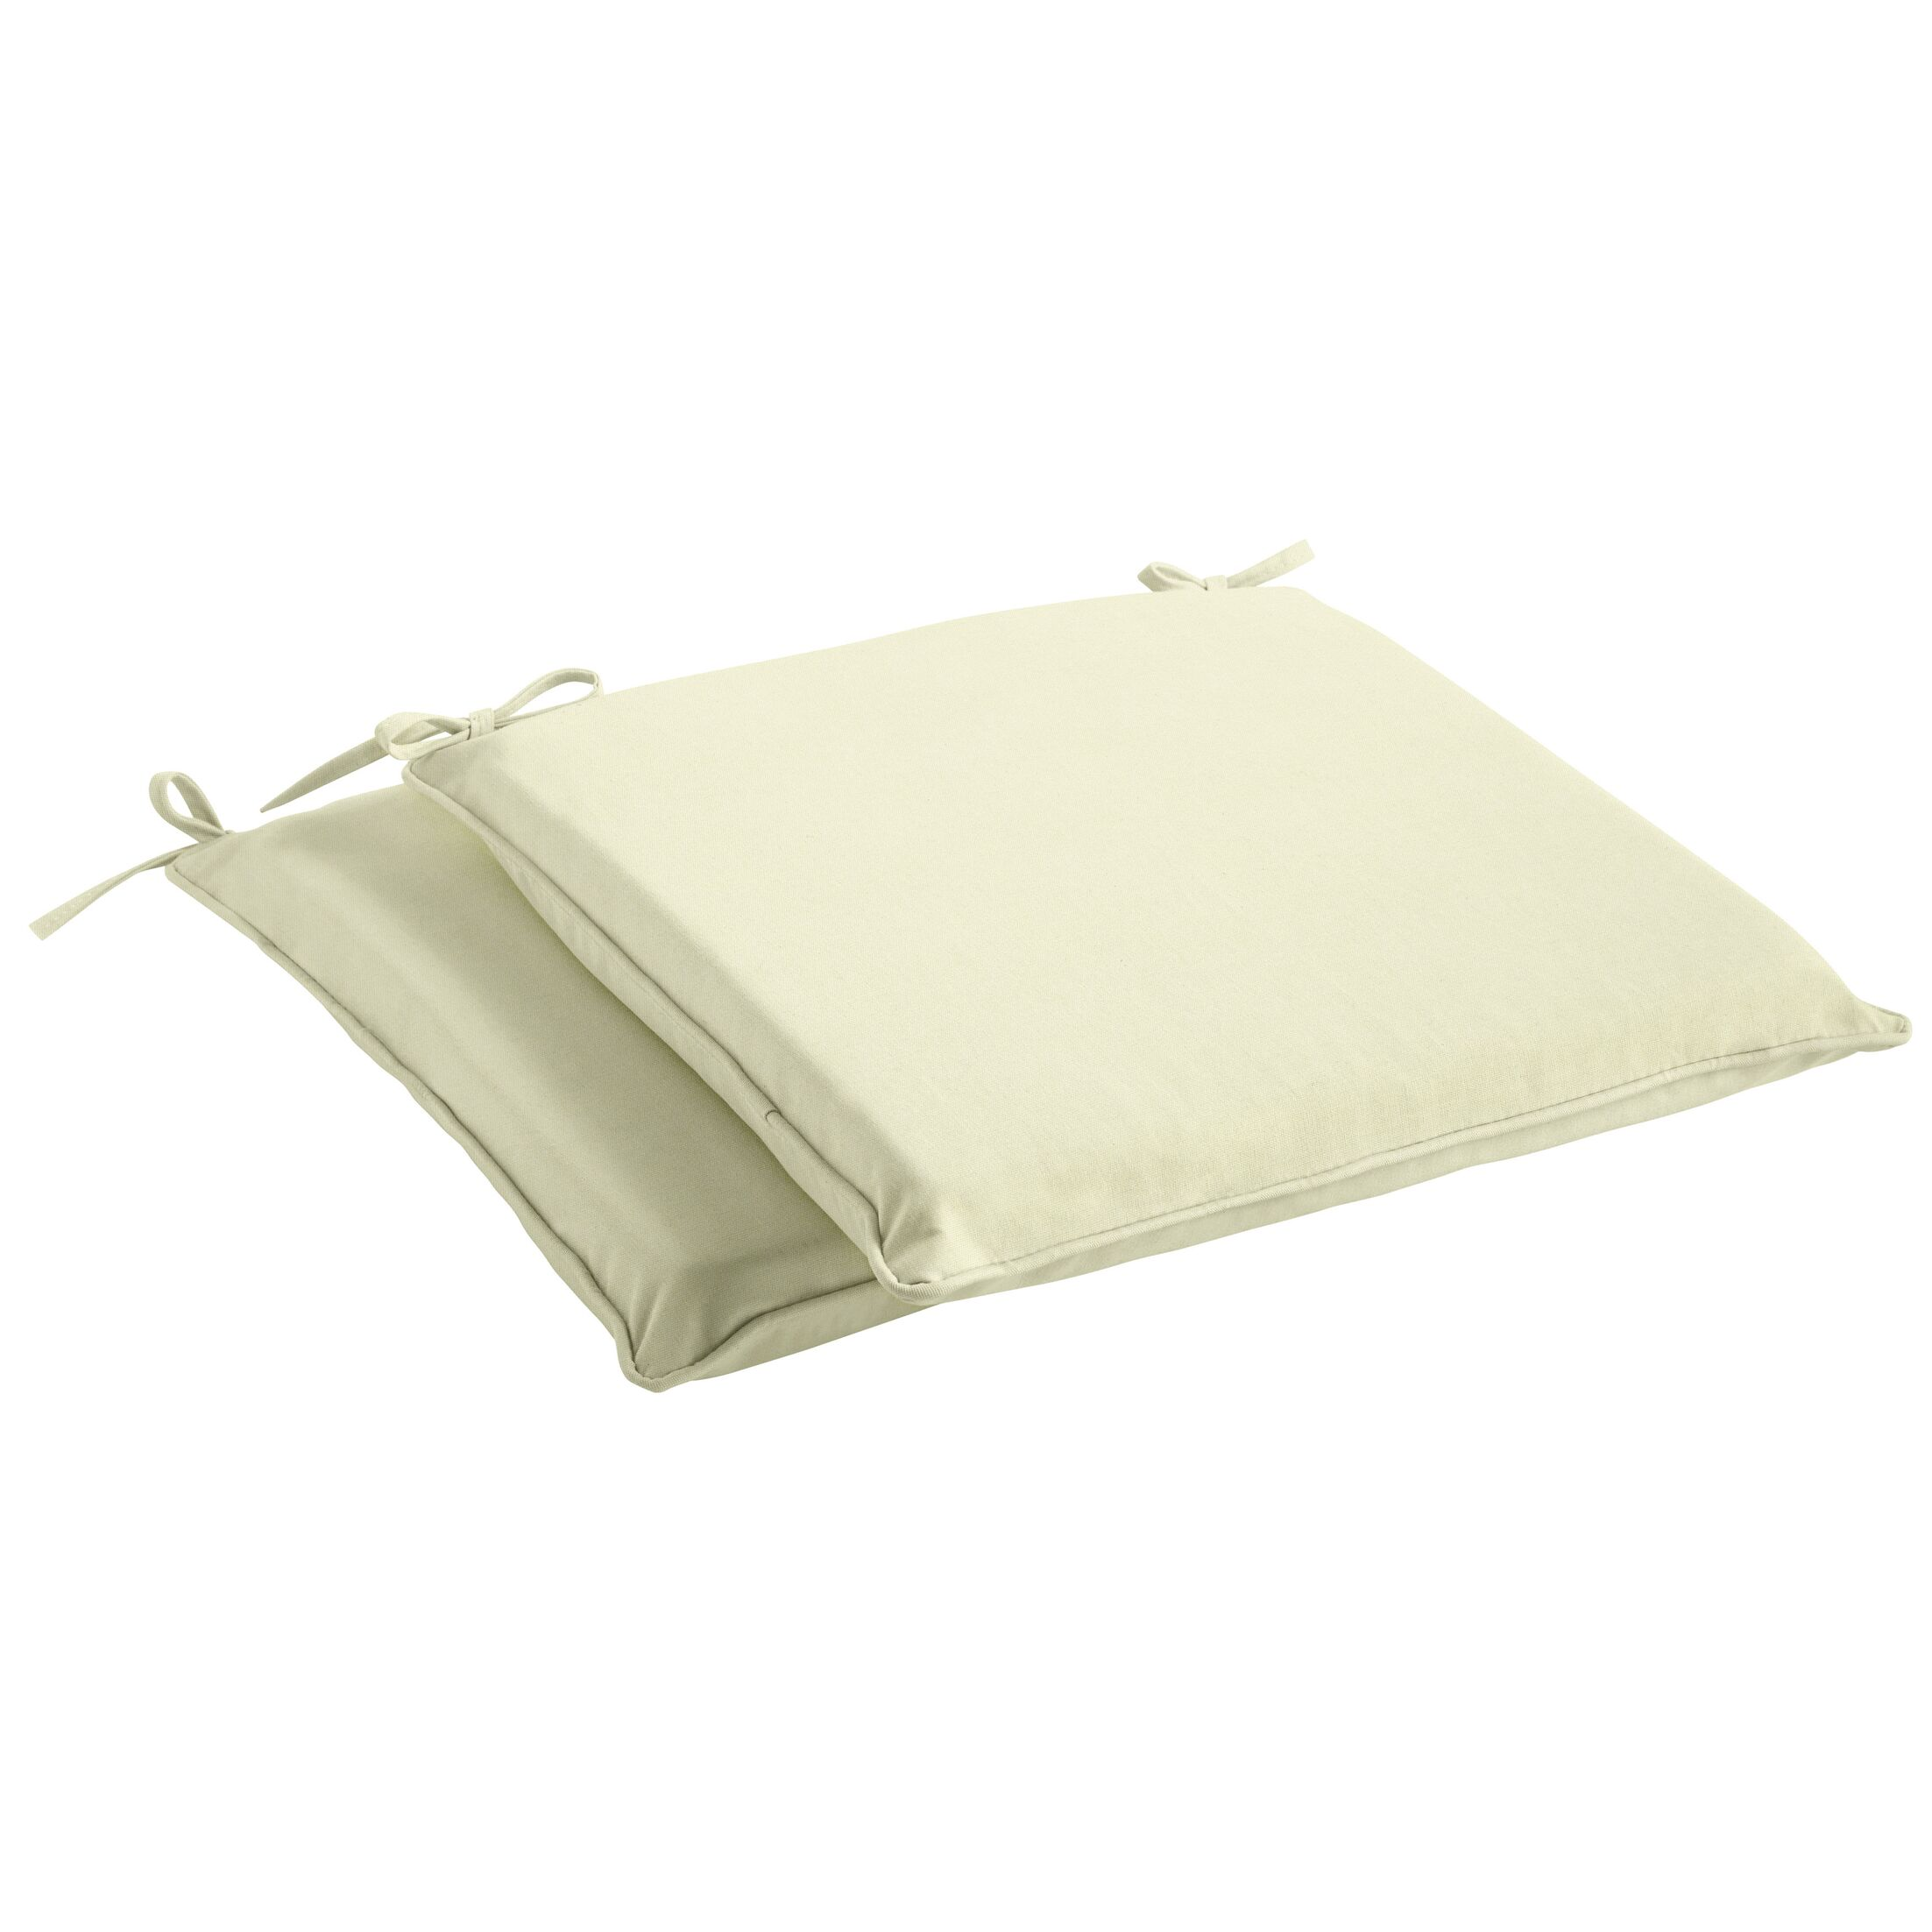 Indoor/Outdoor Sunbrella Dining Chair Cushion Size: 2